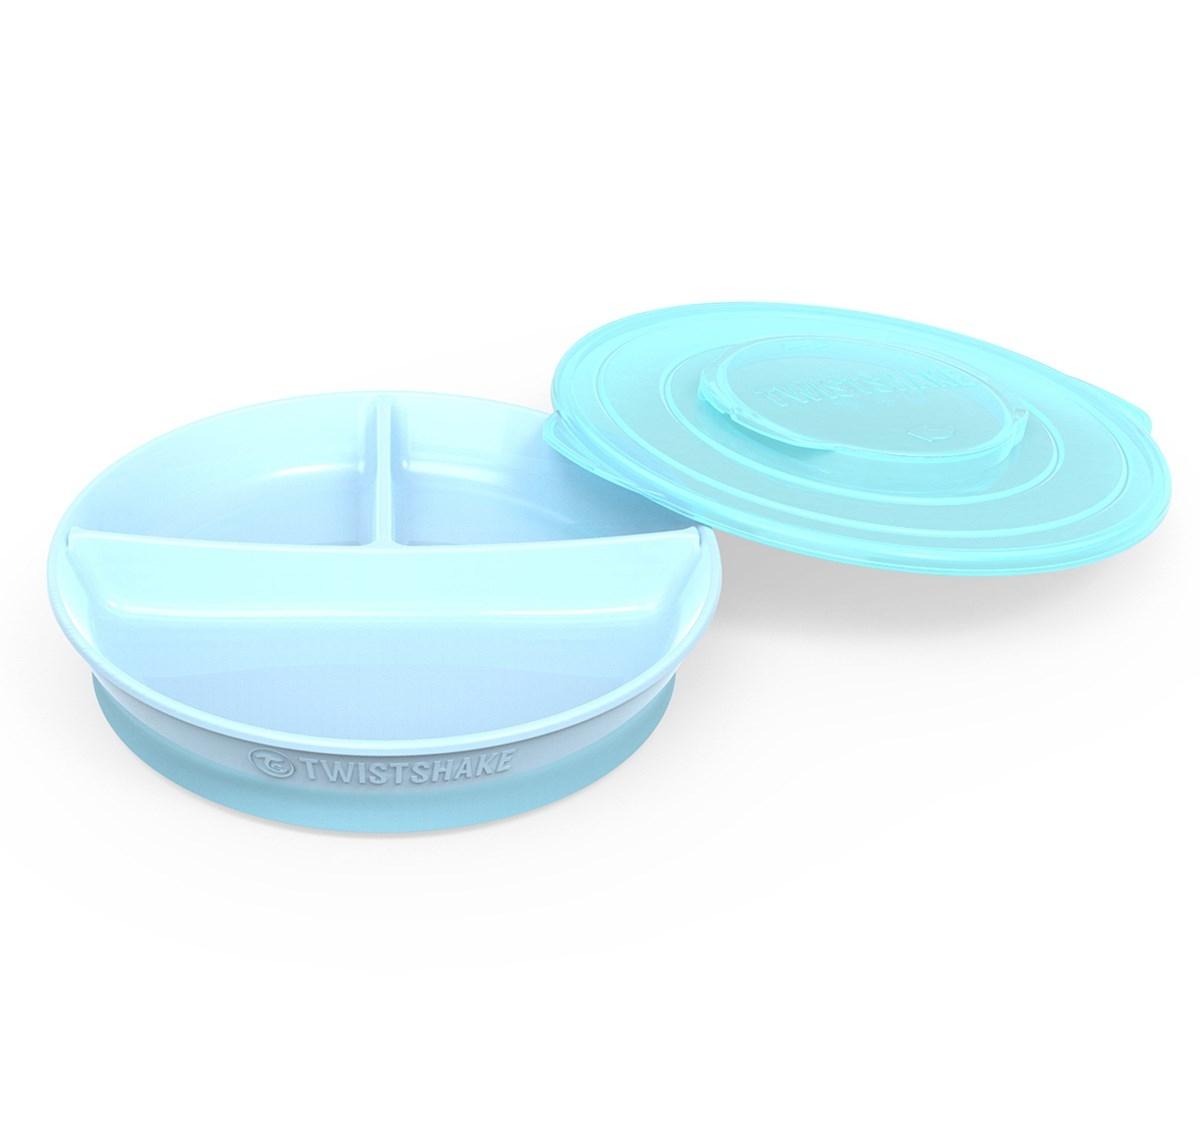 Twistshake Πιάτο Φαγητού Με Διαχωριστικά Divided Plate 6+M Γαλάζιο